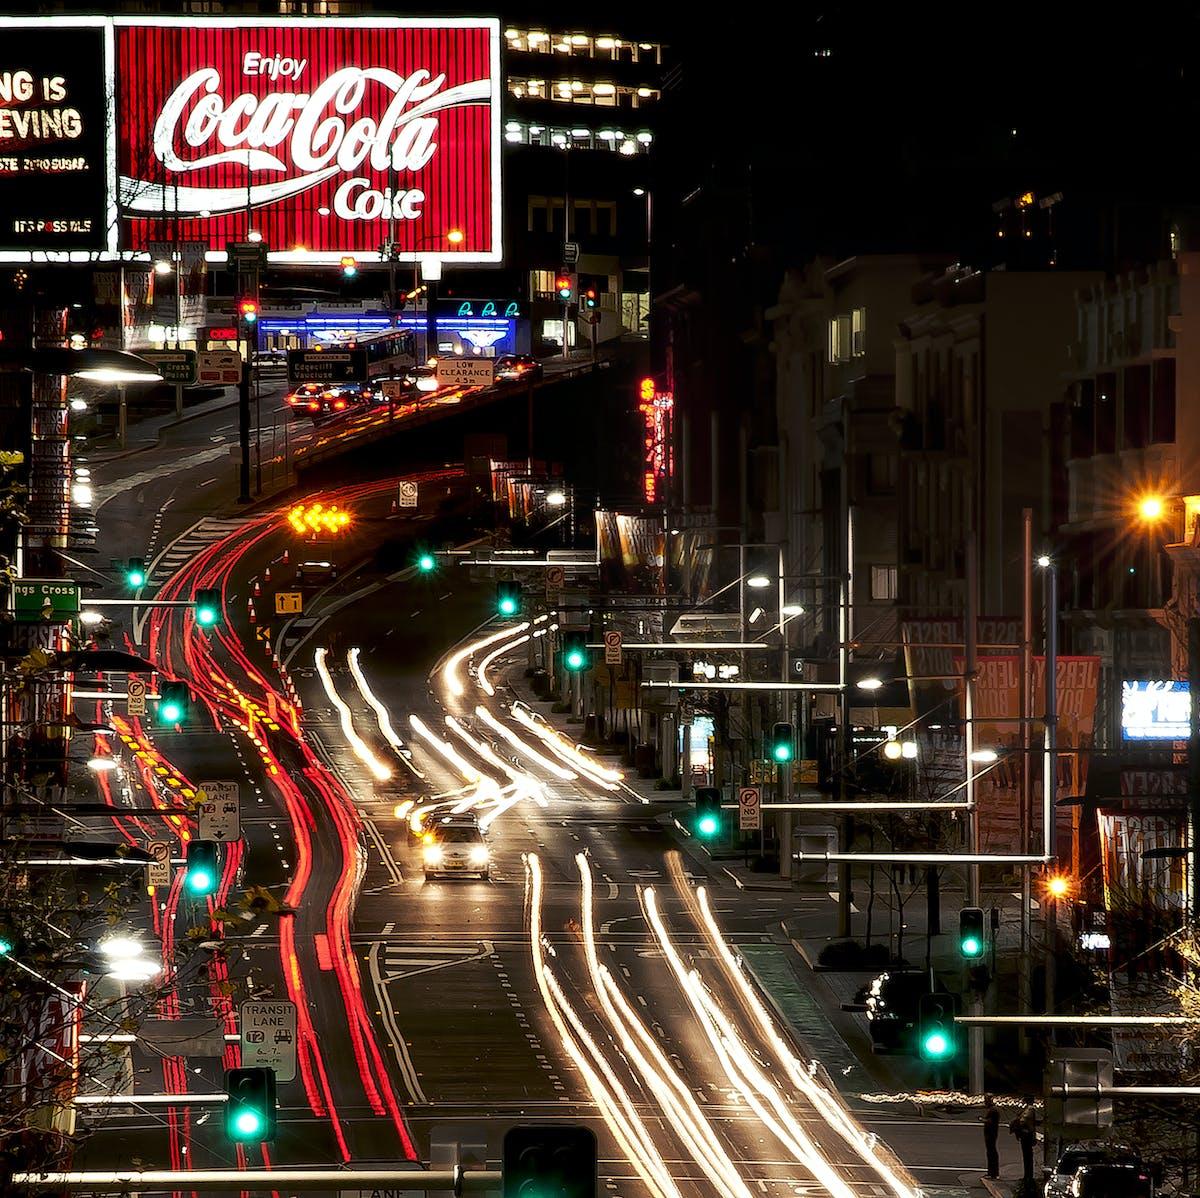 Coca-Cola: University Records Show Coke's Huge Influence on Health Studies